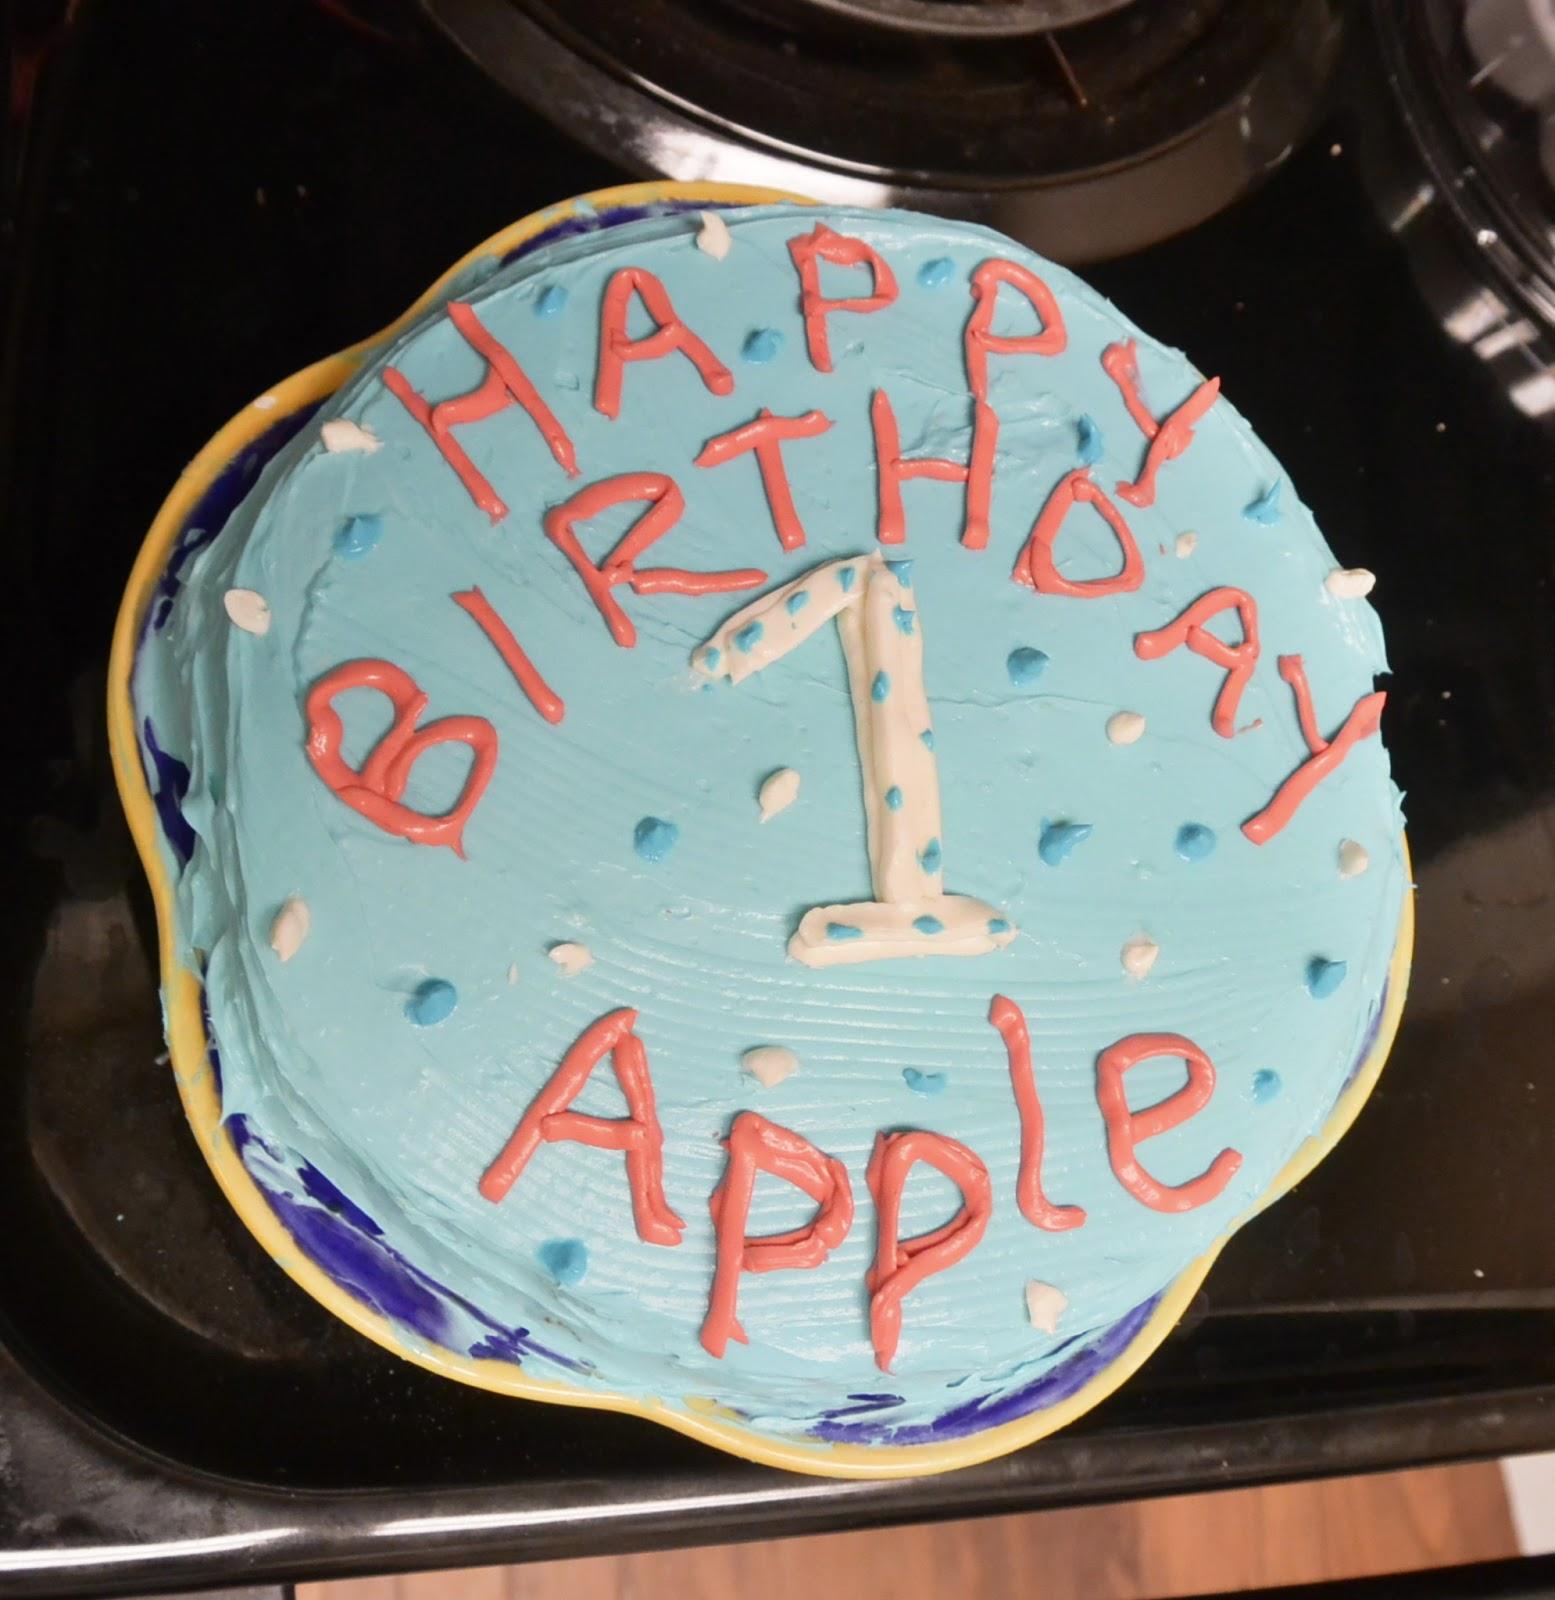 Austin Dog Mom Our Appleversary Cake